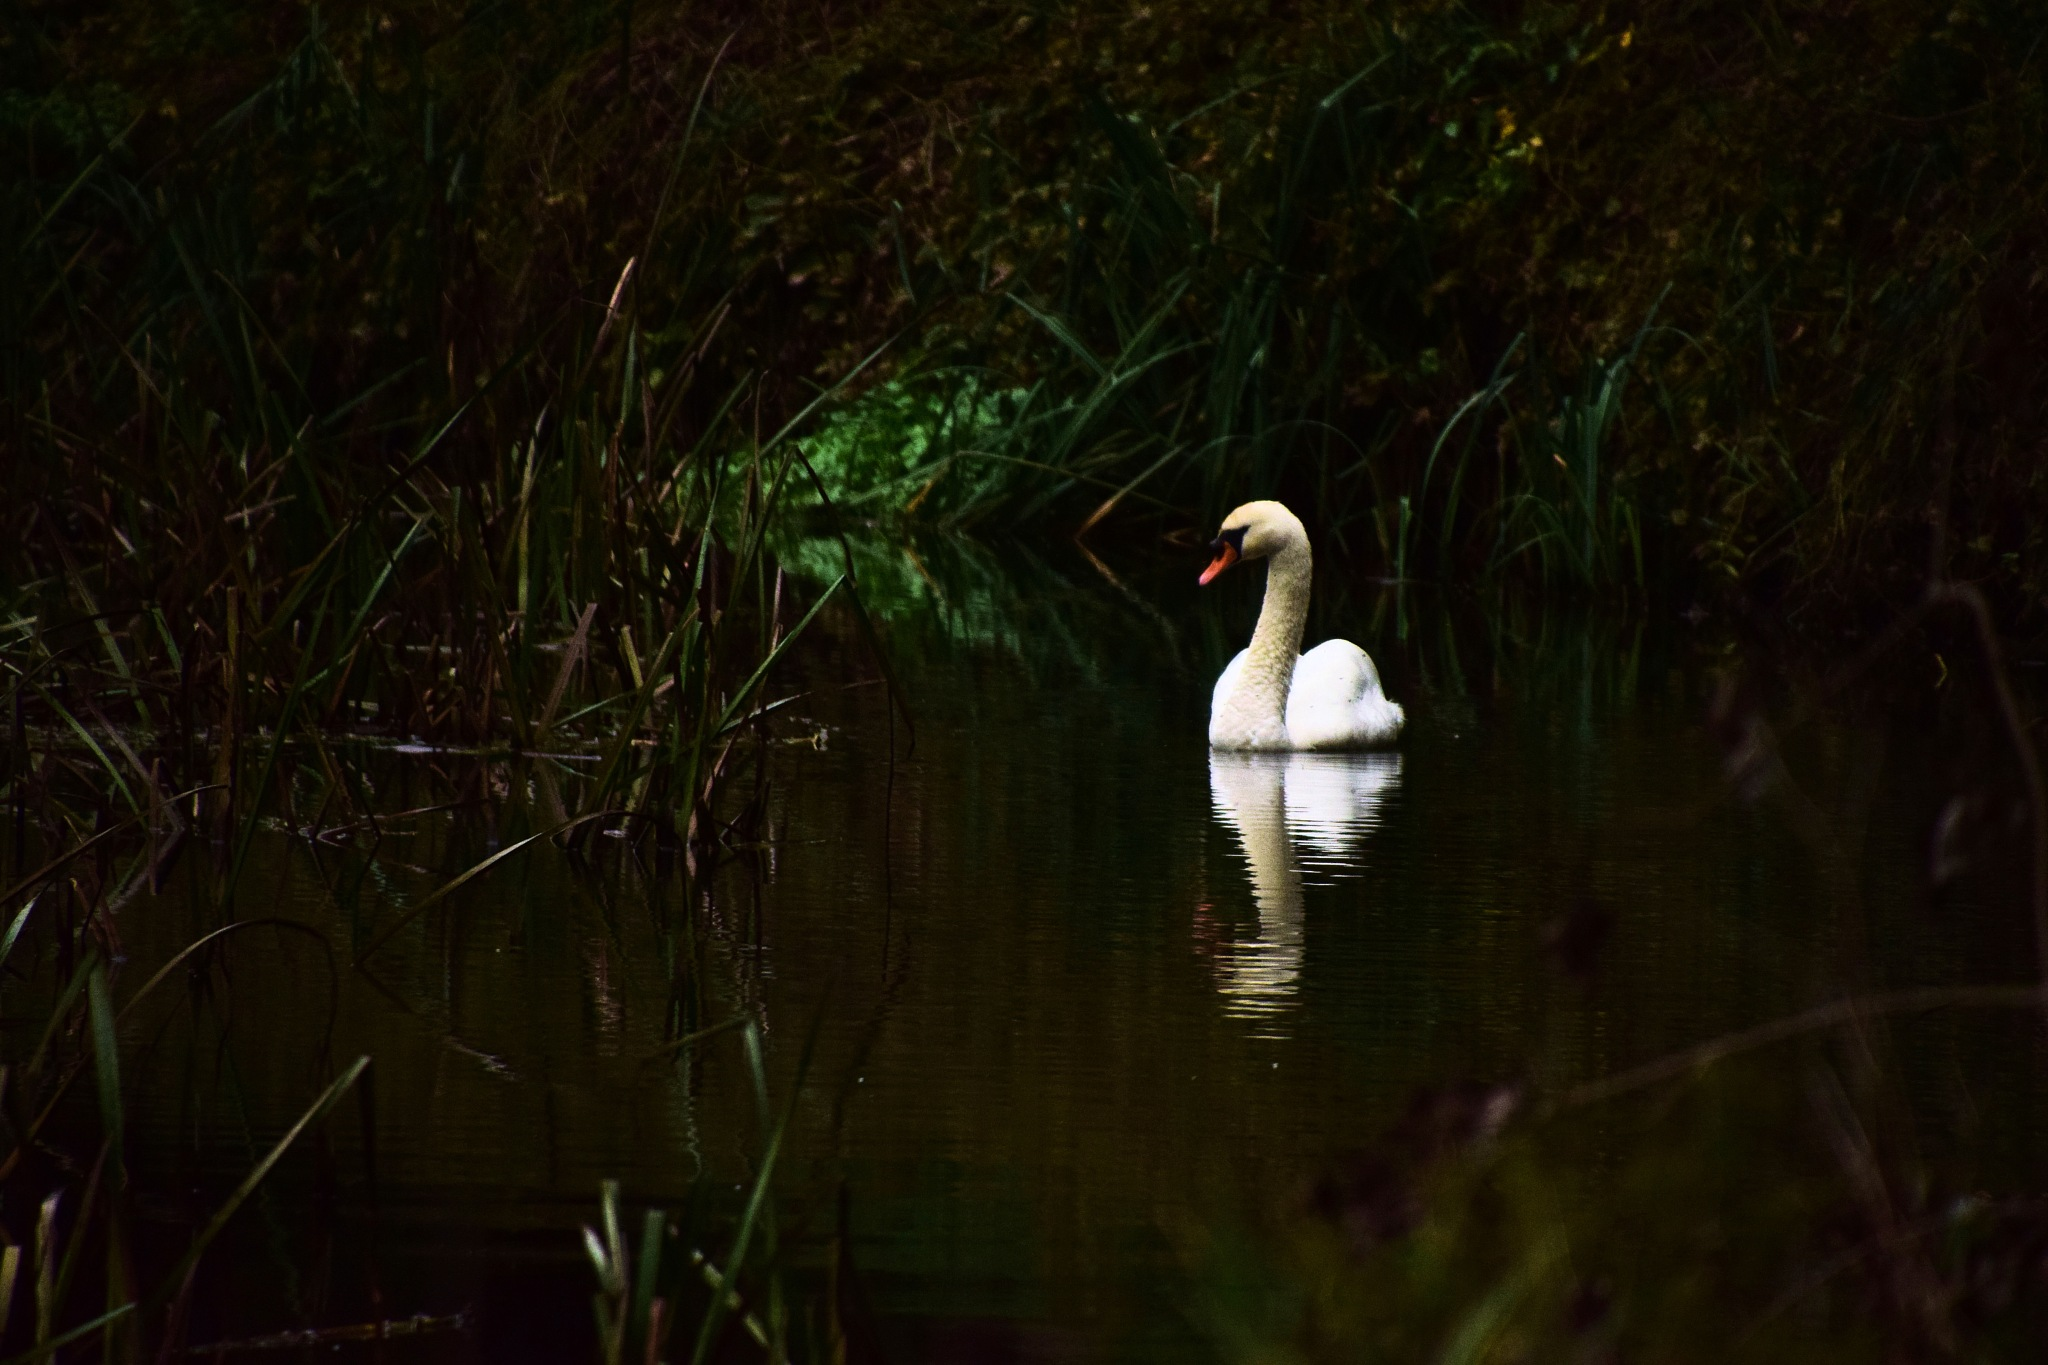 DarK SwaN  by Ian Alastair Trenor Photography